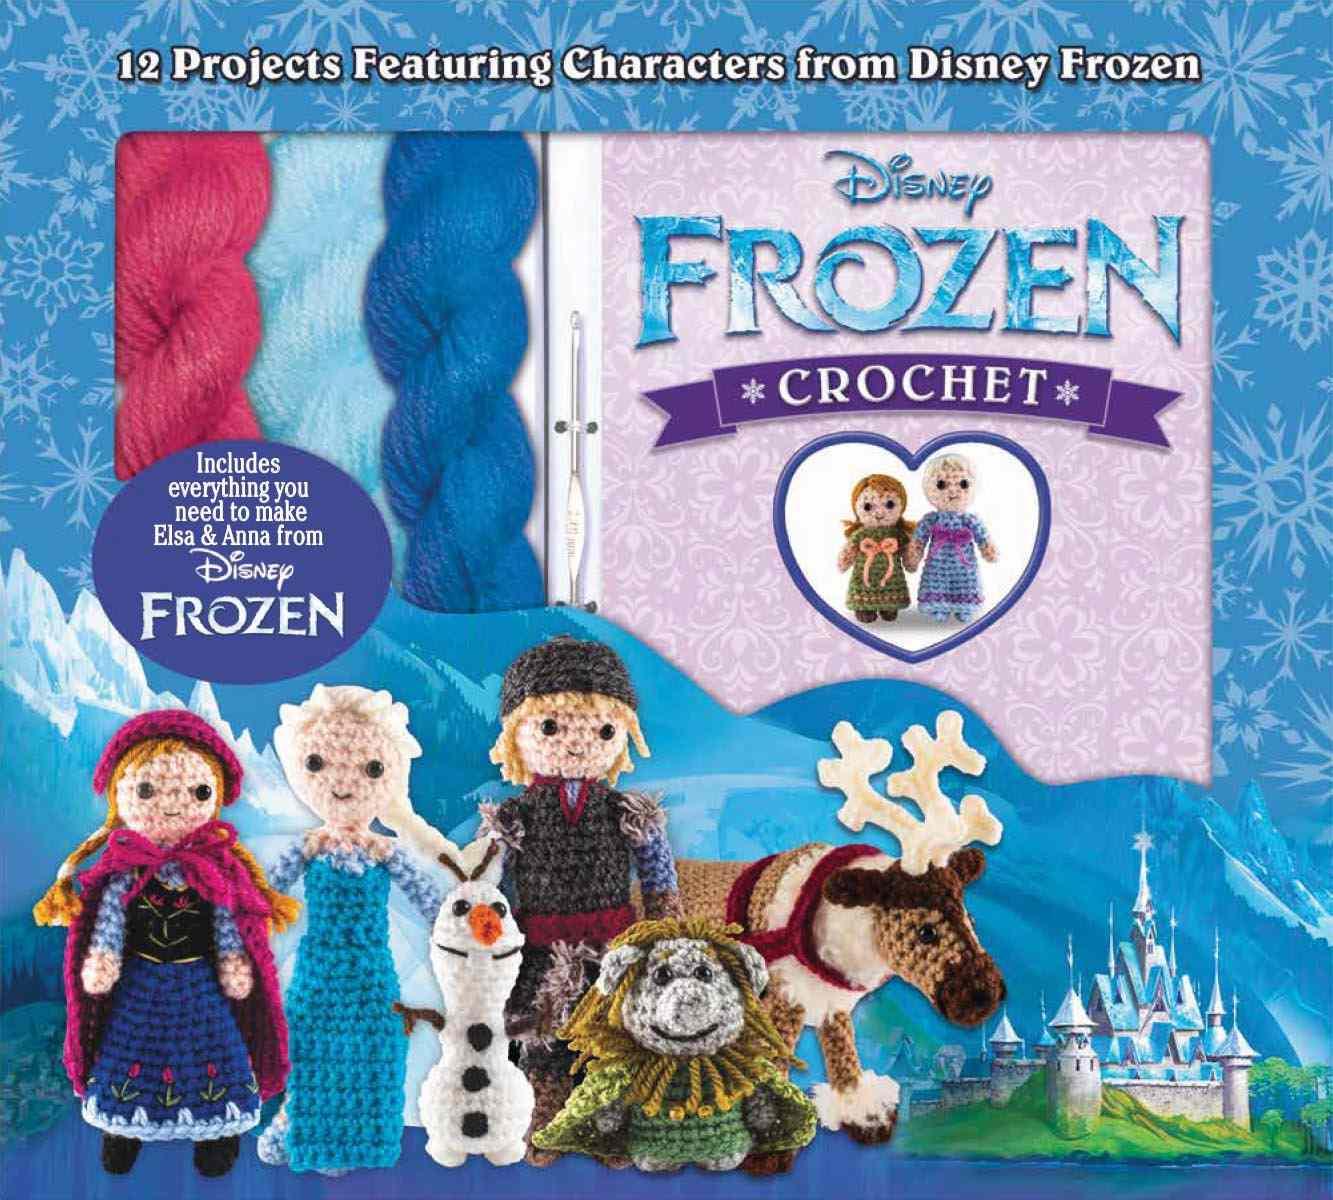 Frozen character crochet kit